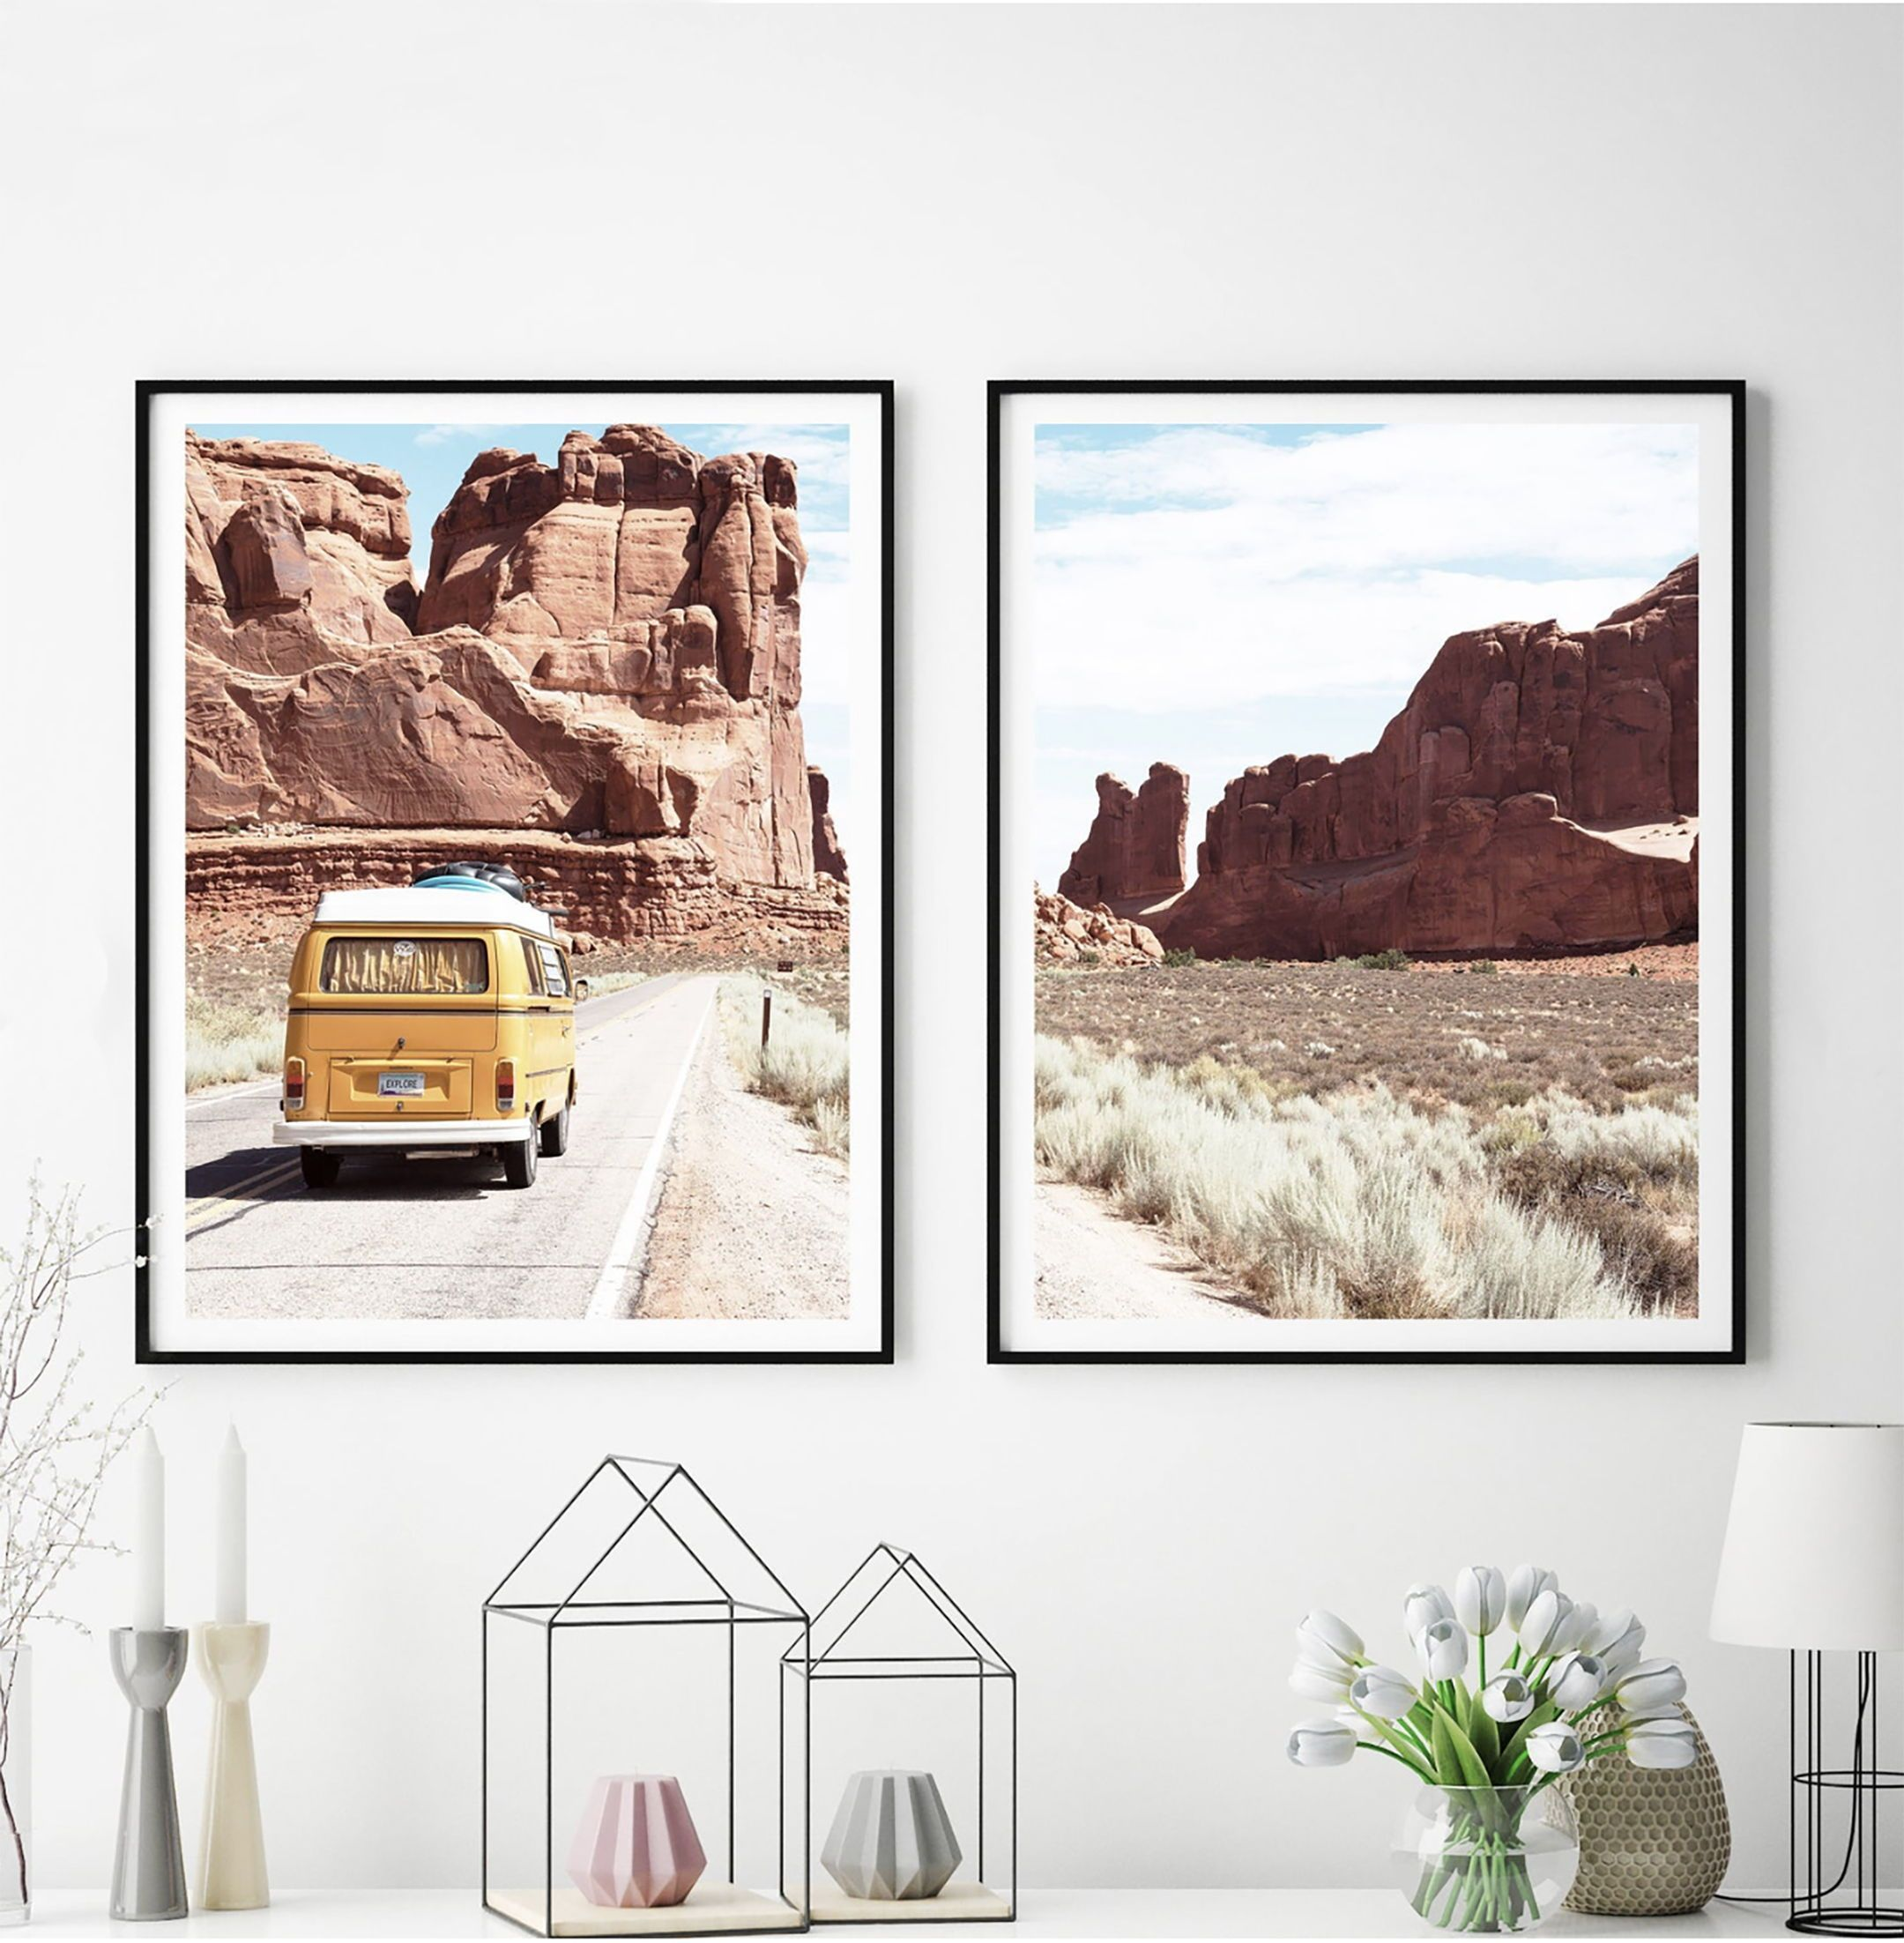 Set Of 2 Prints Retro Van Print Desert Wall Art Vw Automobile South Western Landscape Decor Printable Ar Landscape Decor Landscape Wall Art Printable Art